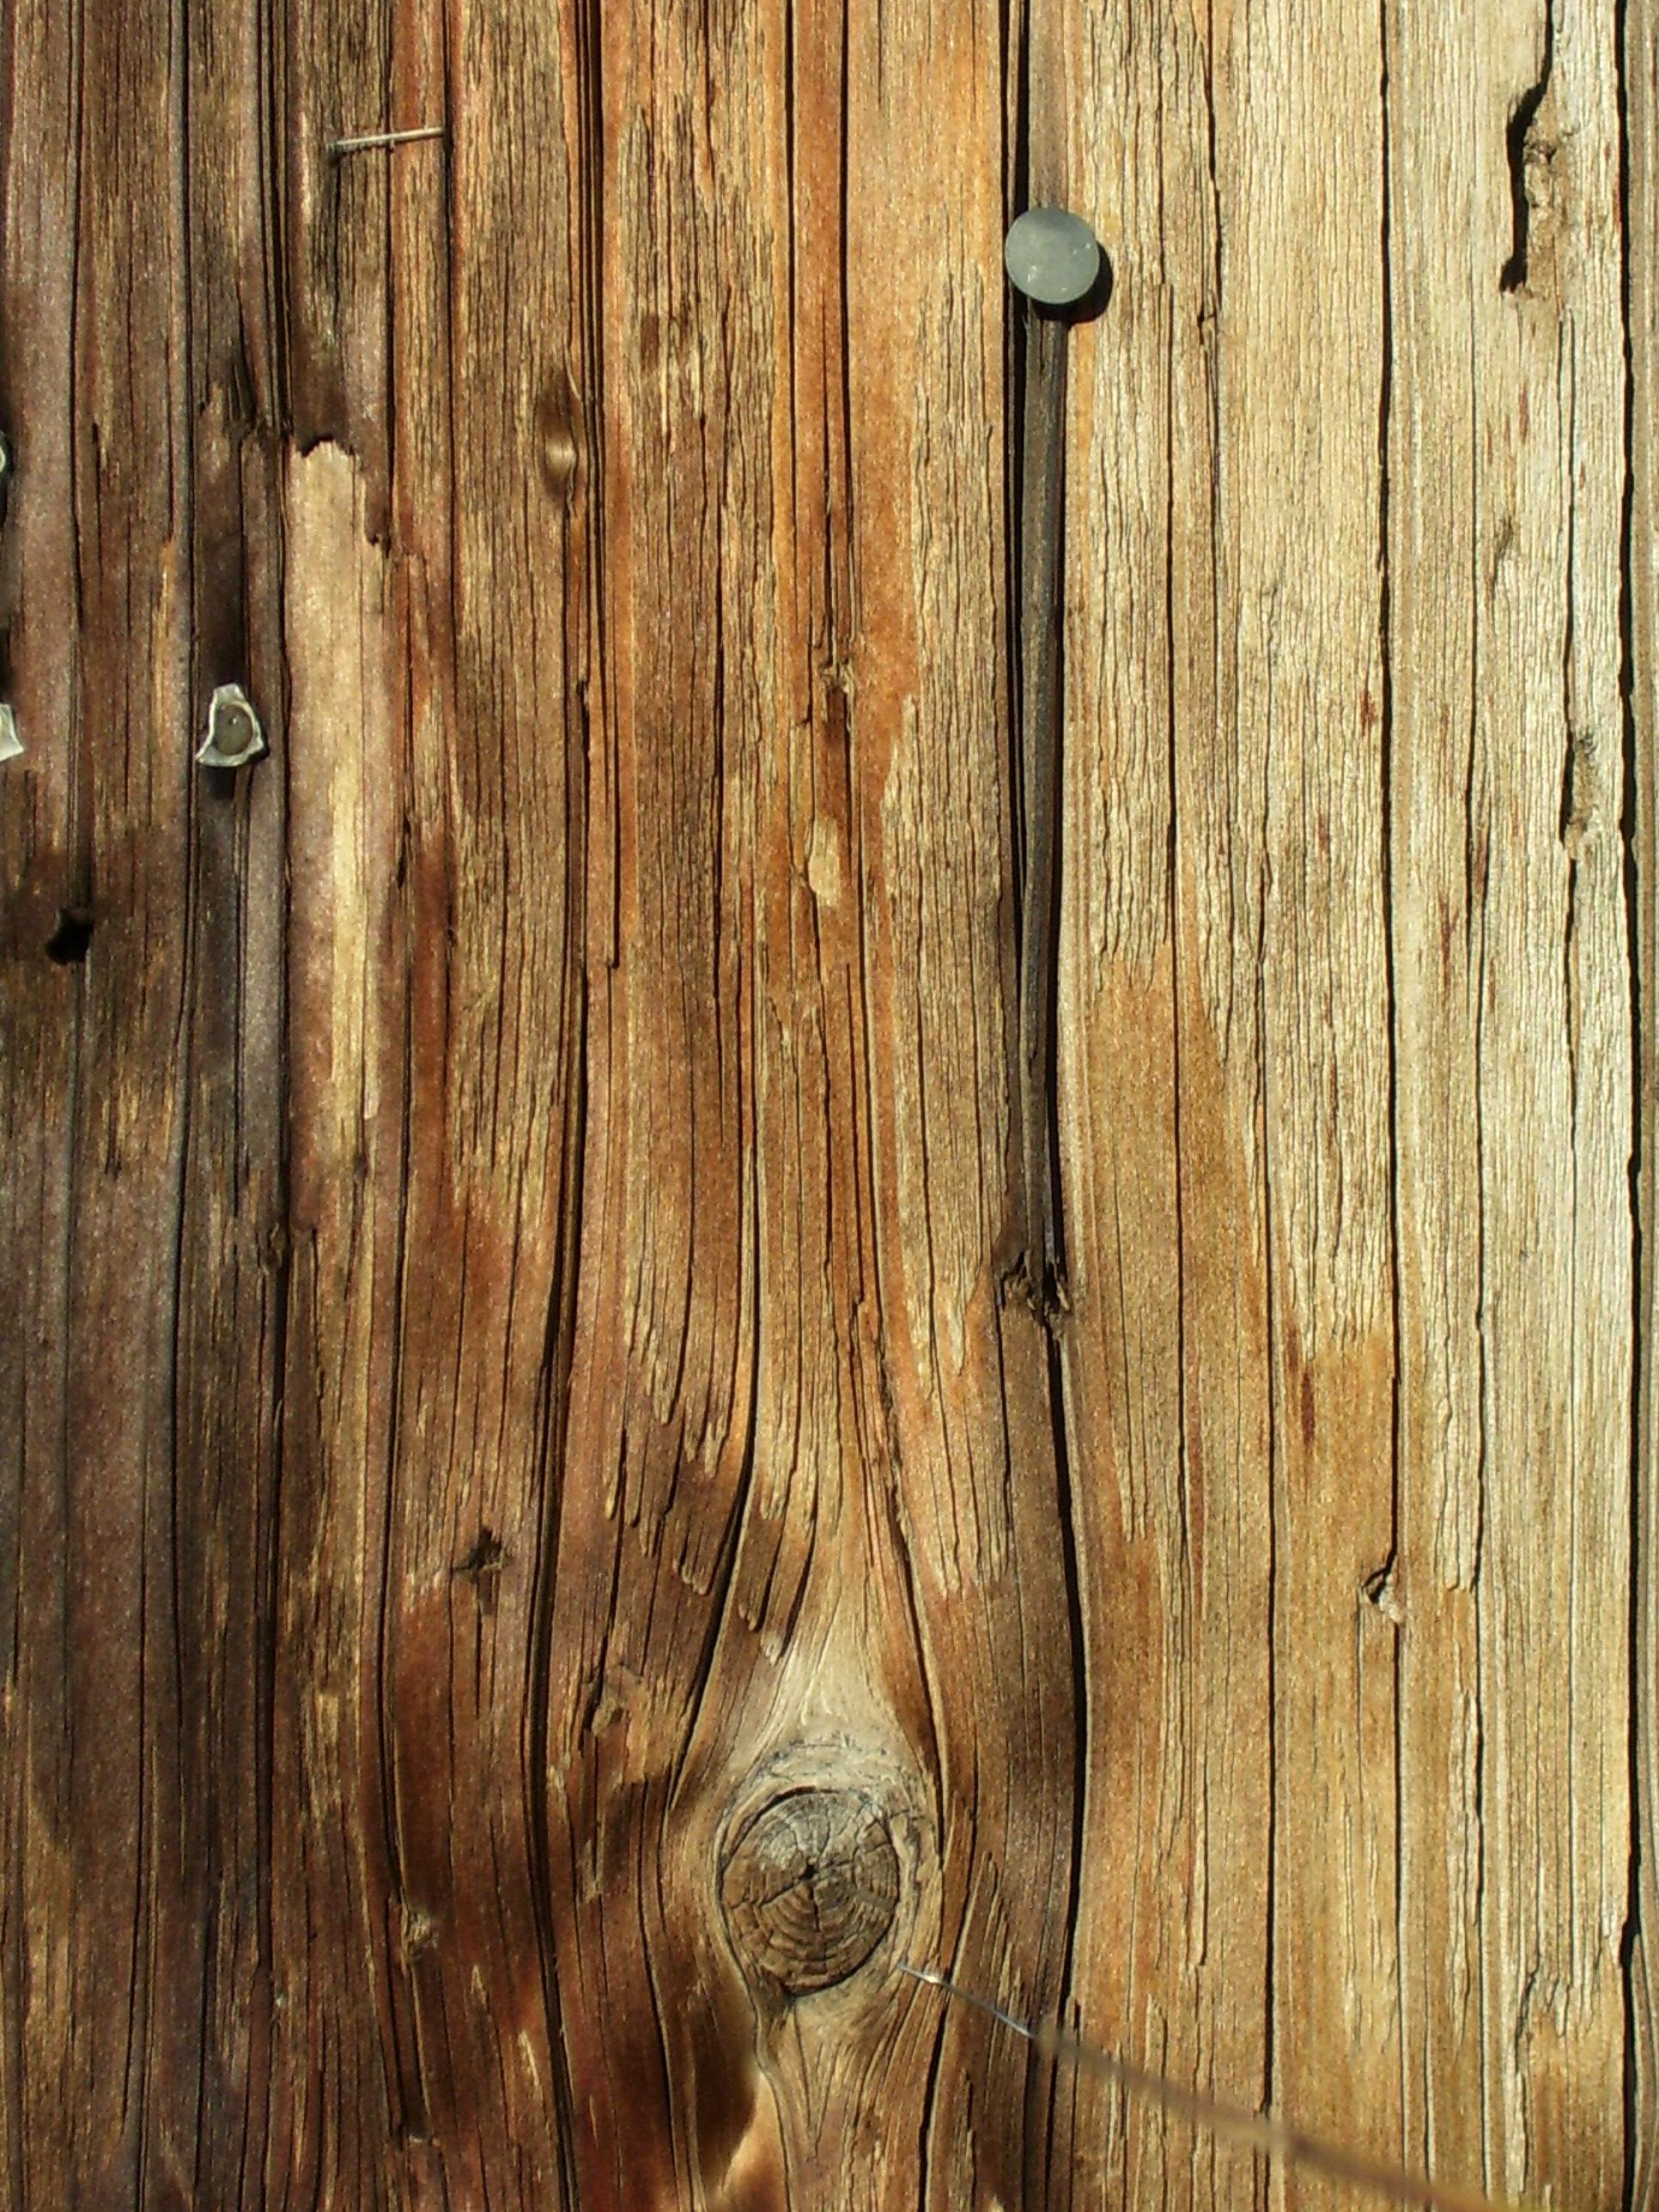 Wood Texture Stock